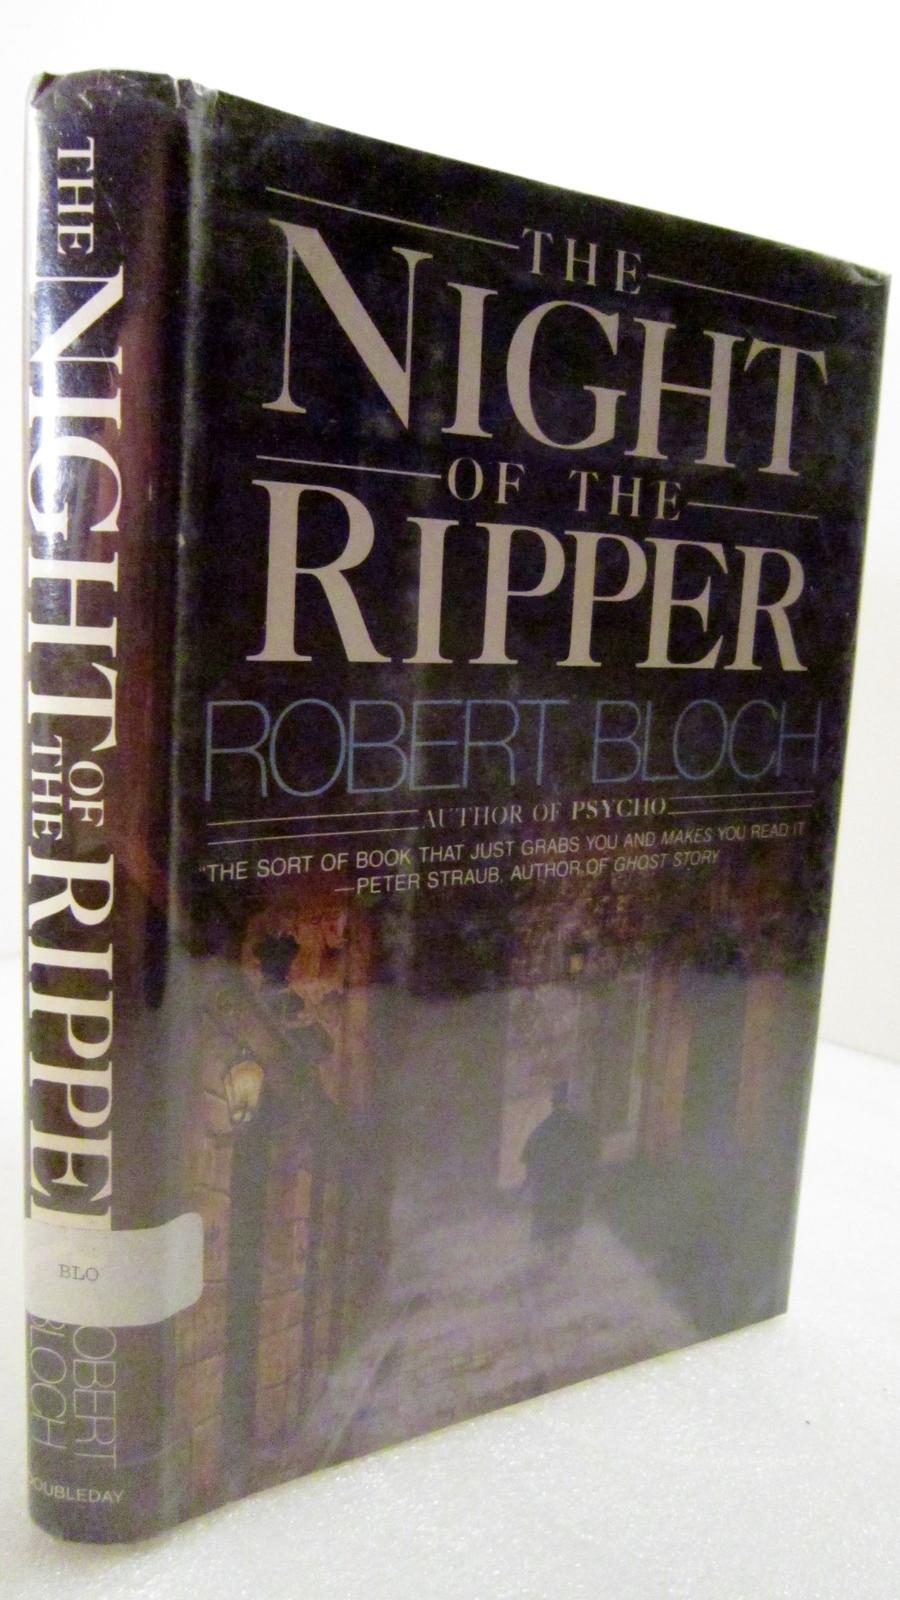 Night of the ripper 1984 robert bloch 01